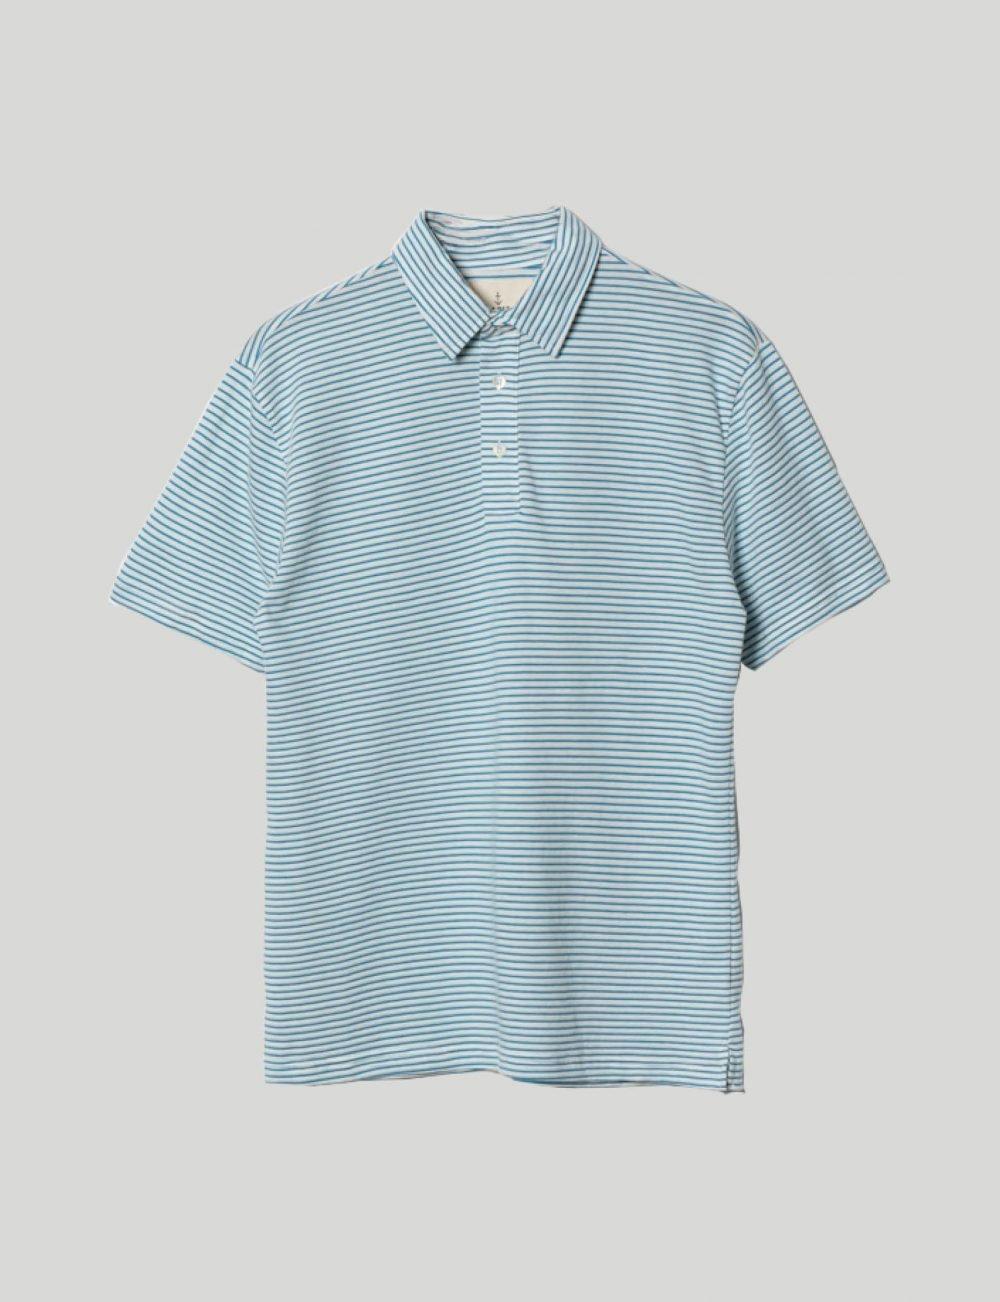 Castart - La Paz - Leao Polo - Striped Blue